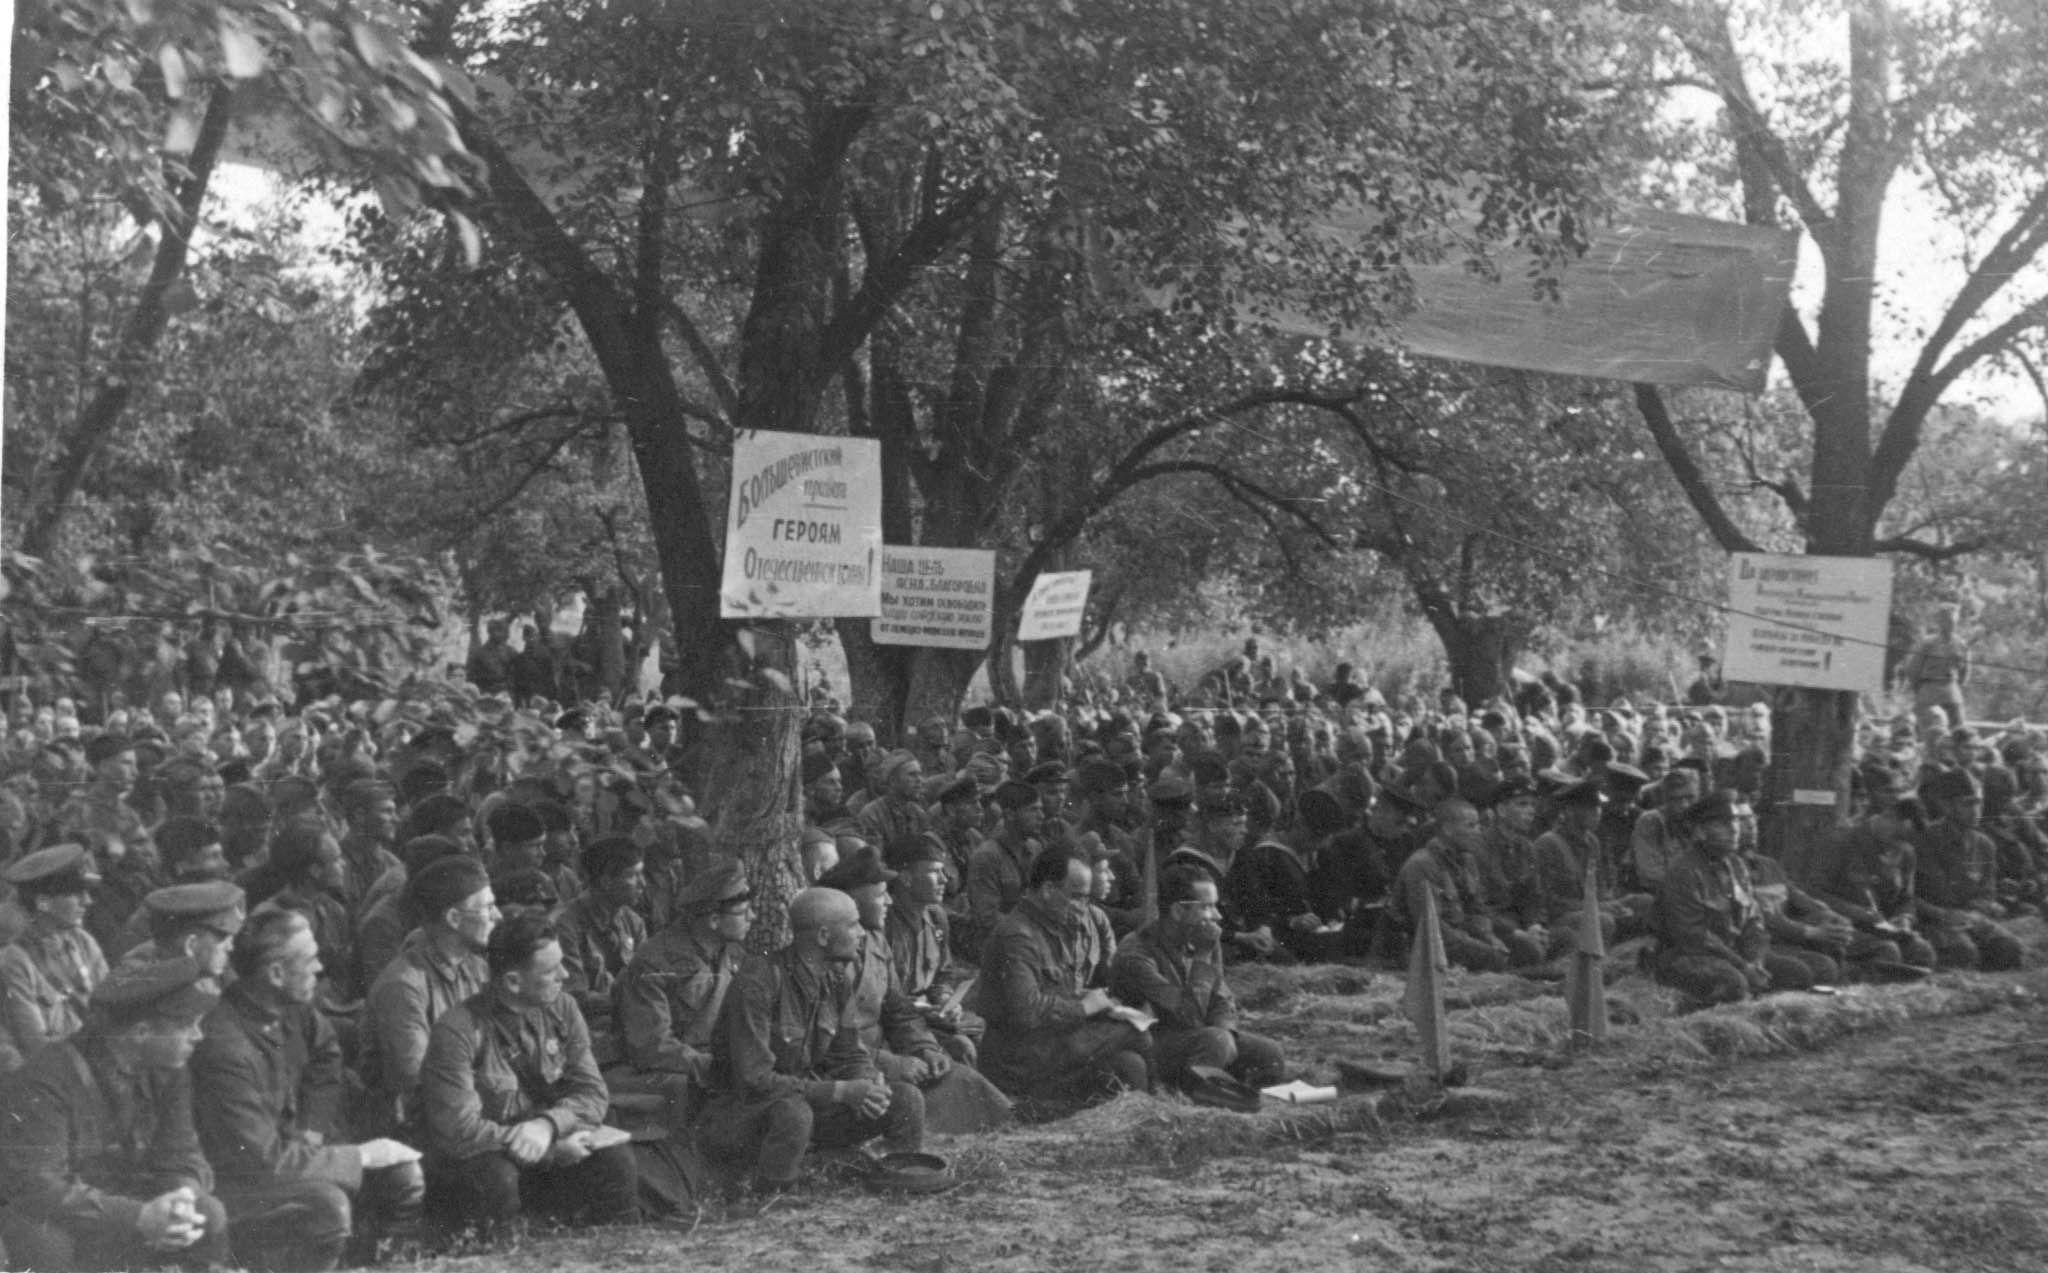 Экспонат #98. Армейское собрание боевого актива в Лисичанске. Март 1942 года